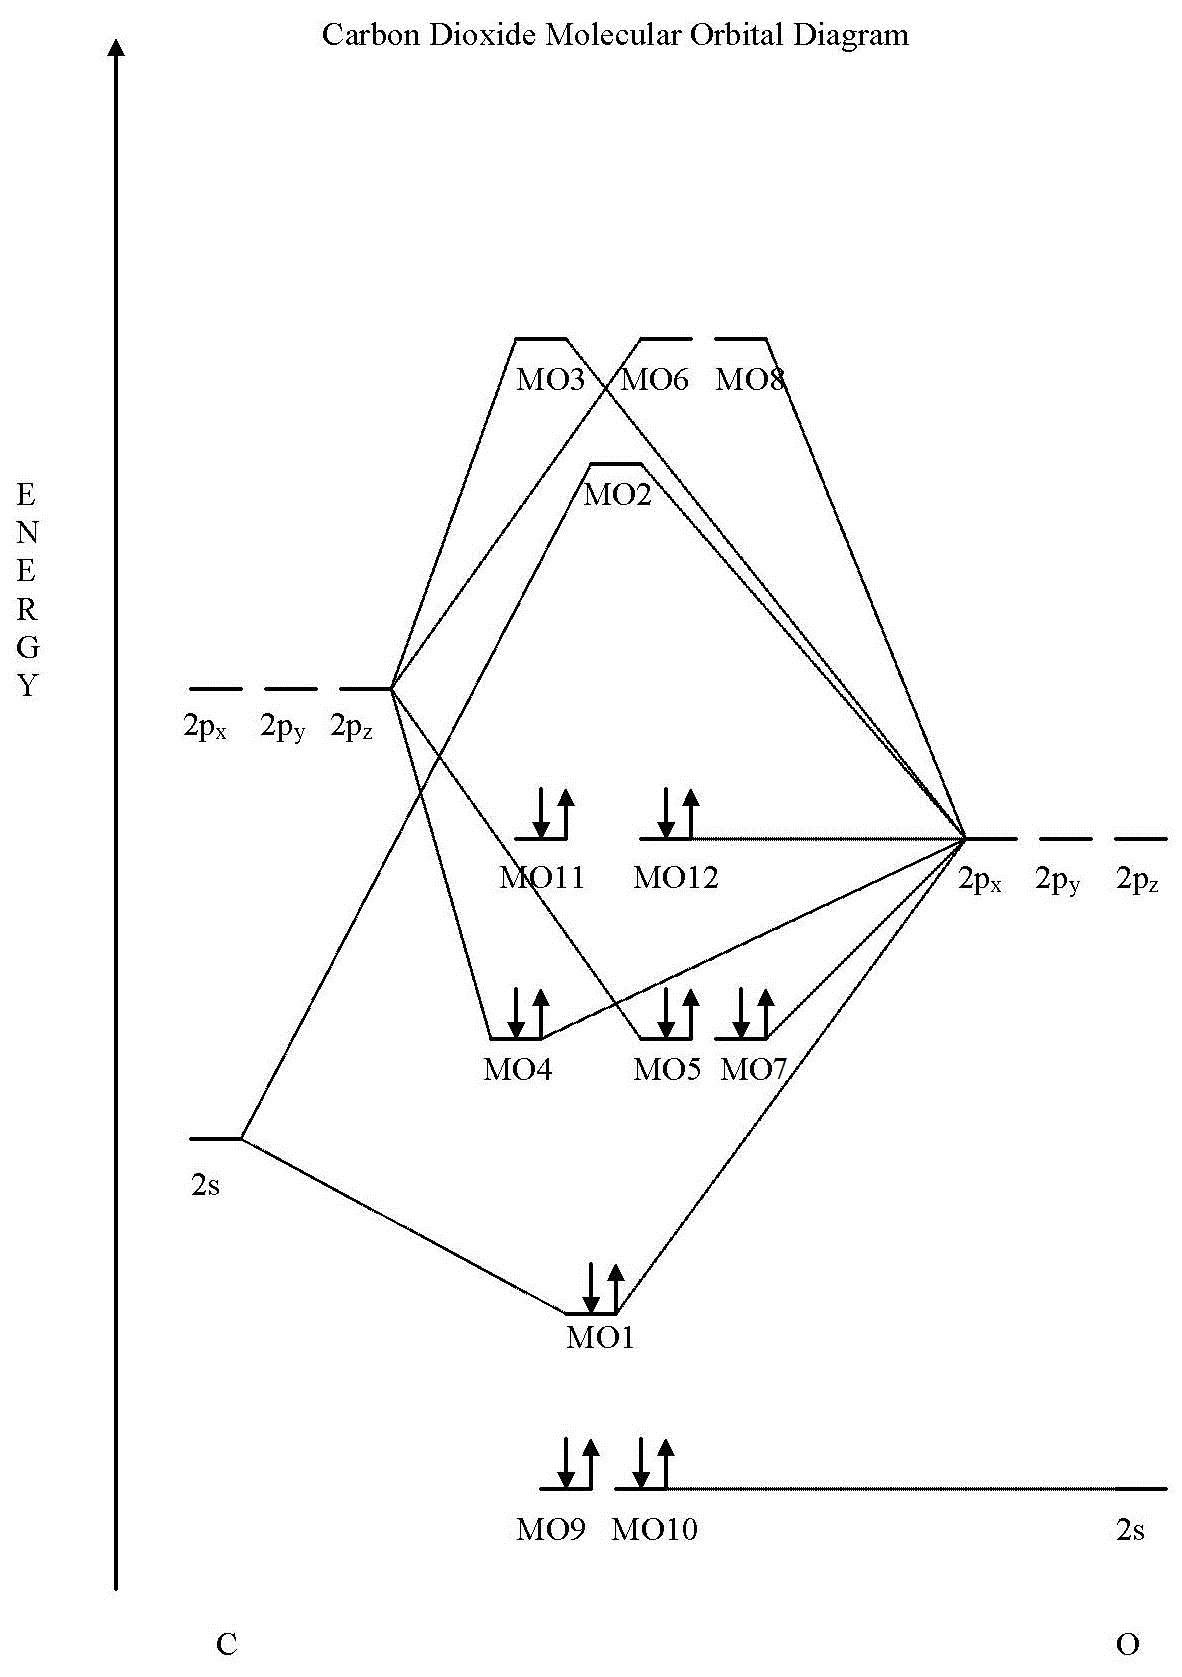 Molecular Orbital Diagram Filemo Diagram Co2 Wikimedia Commons